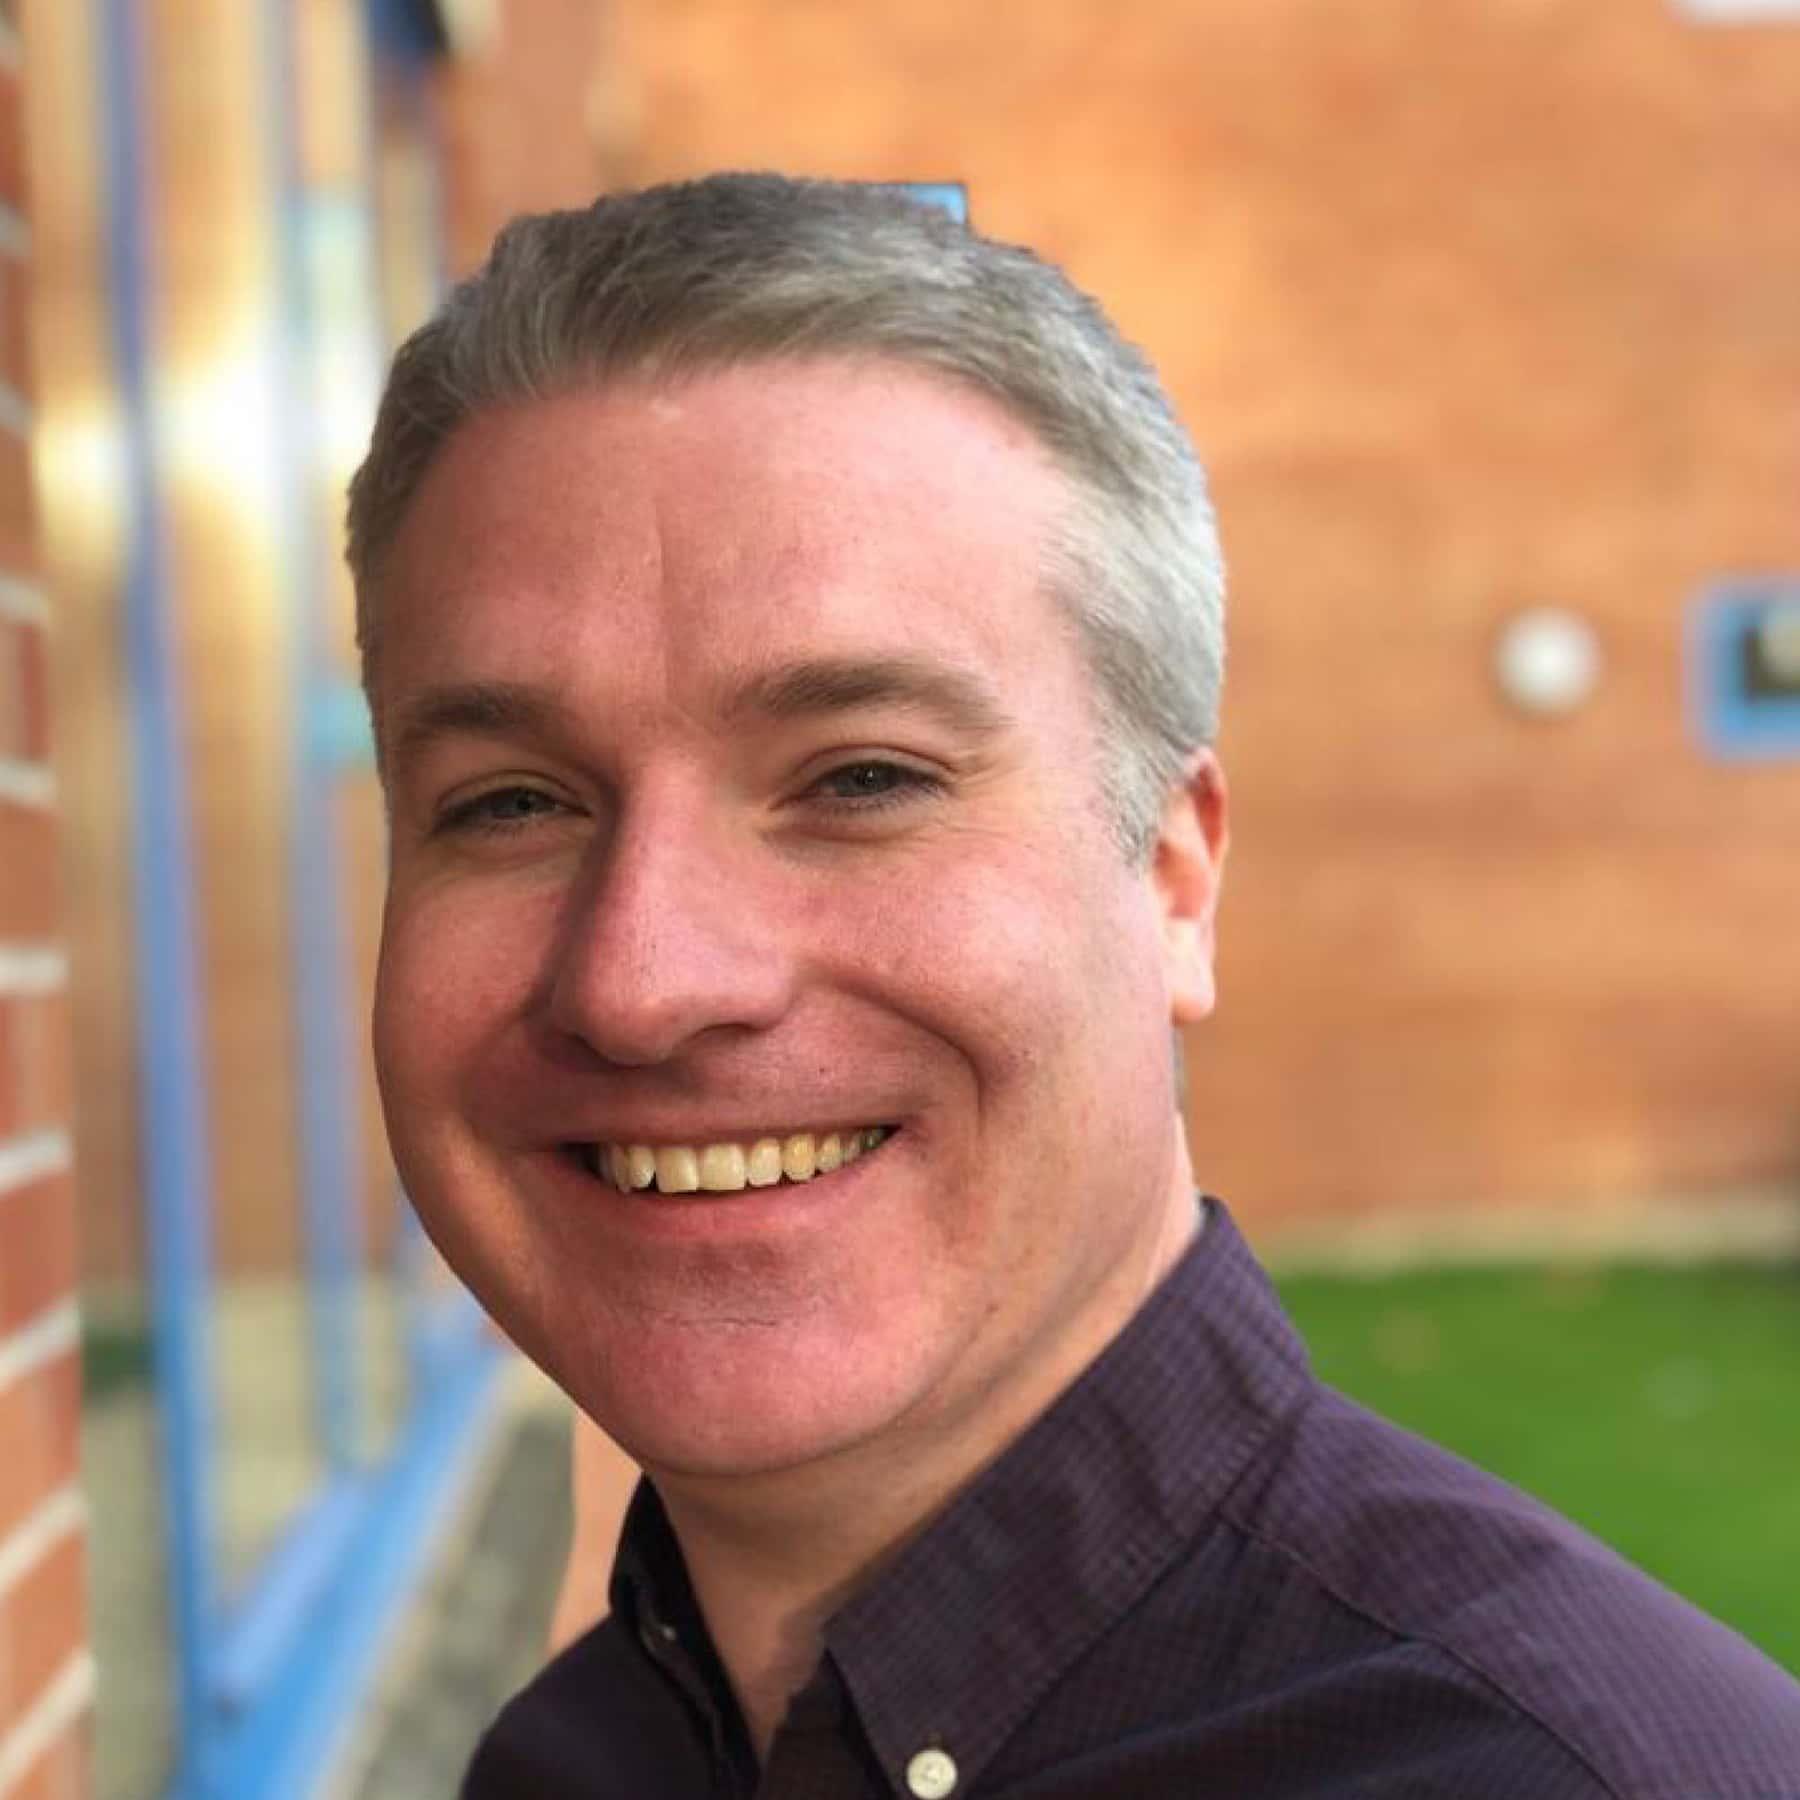 James - Commercial Director, UK